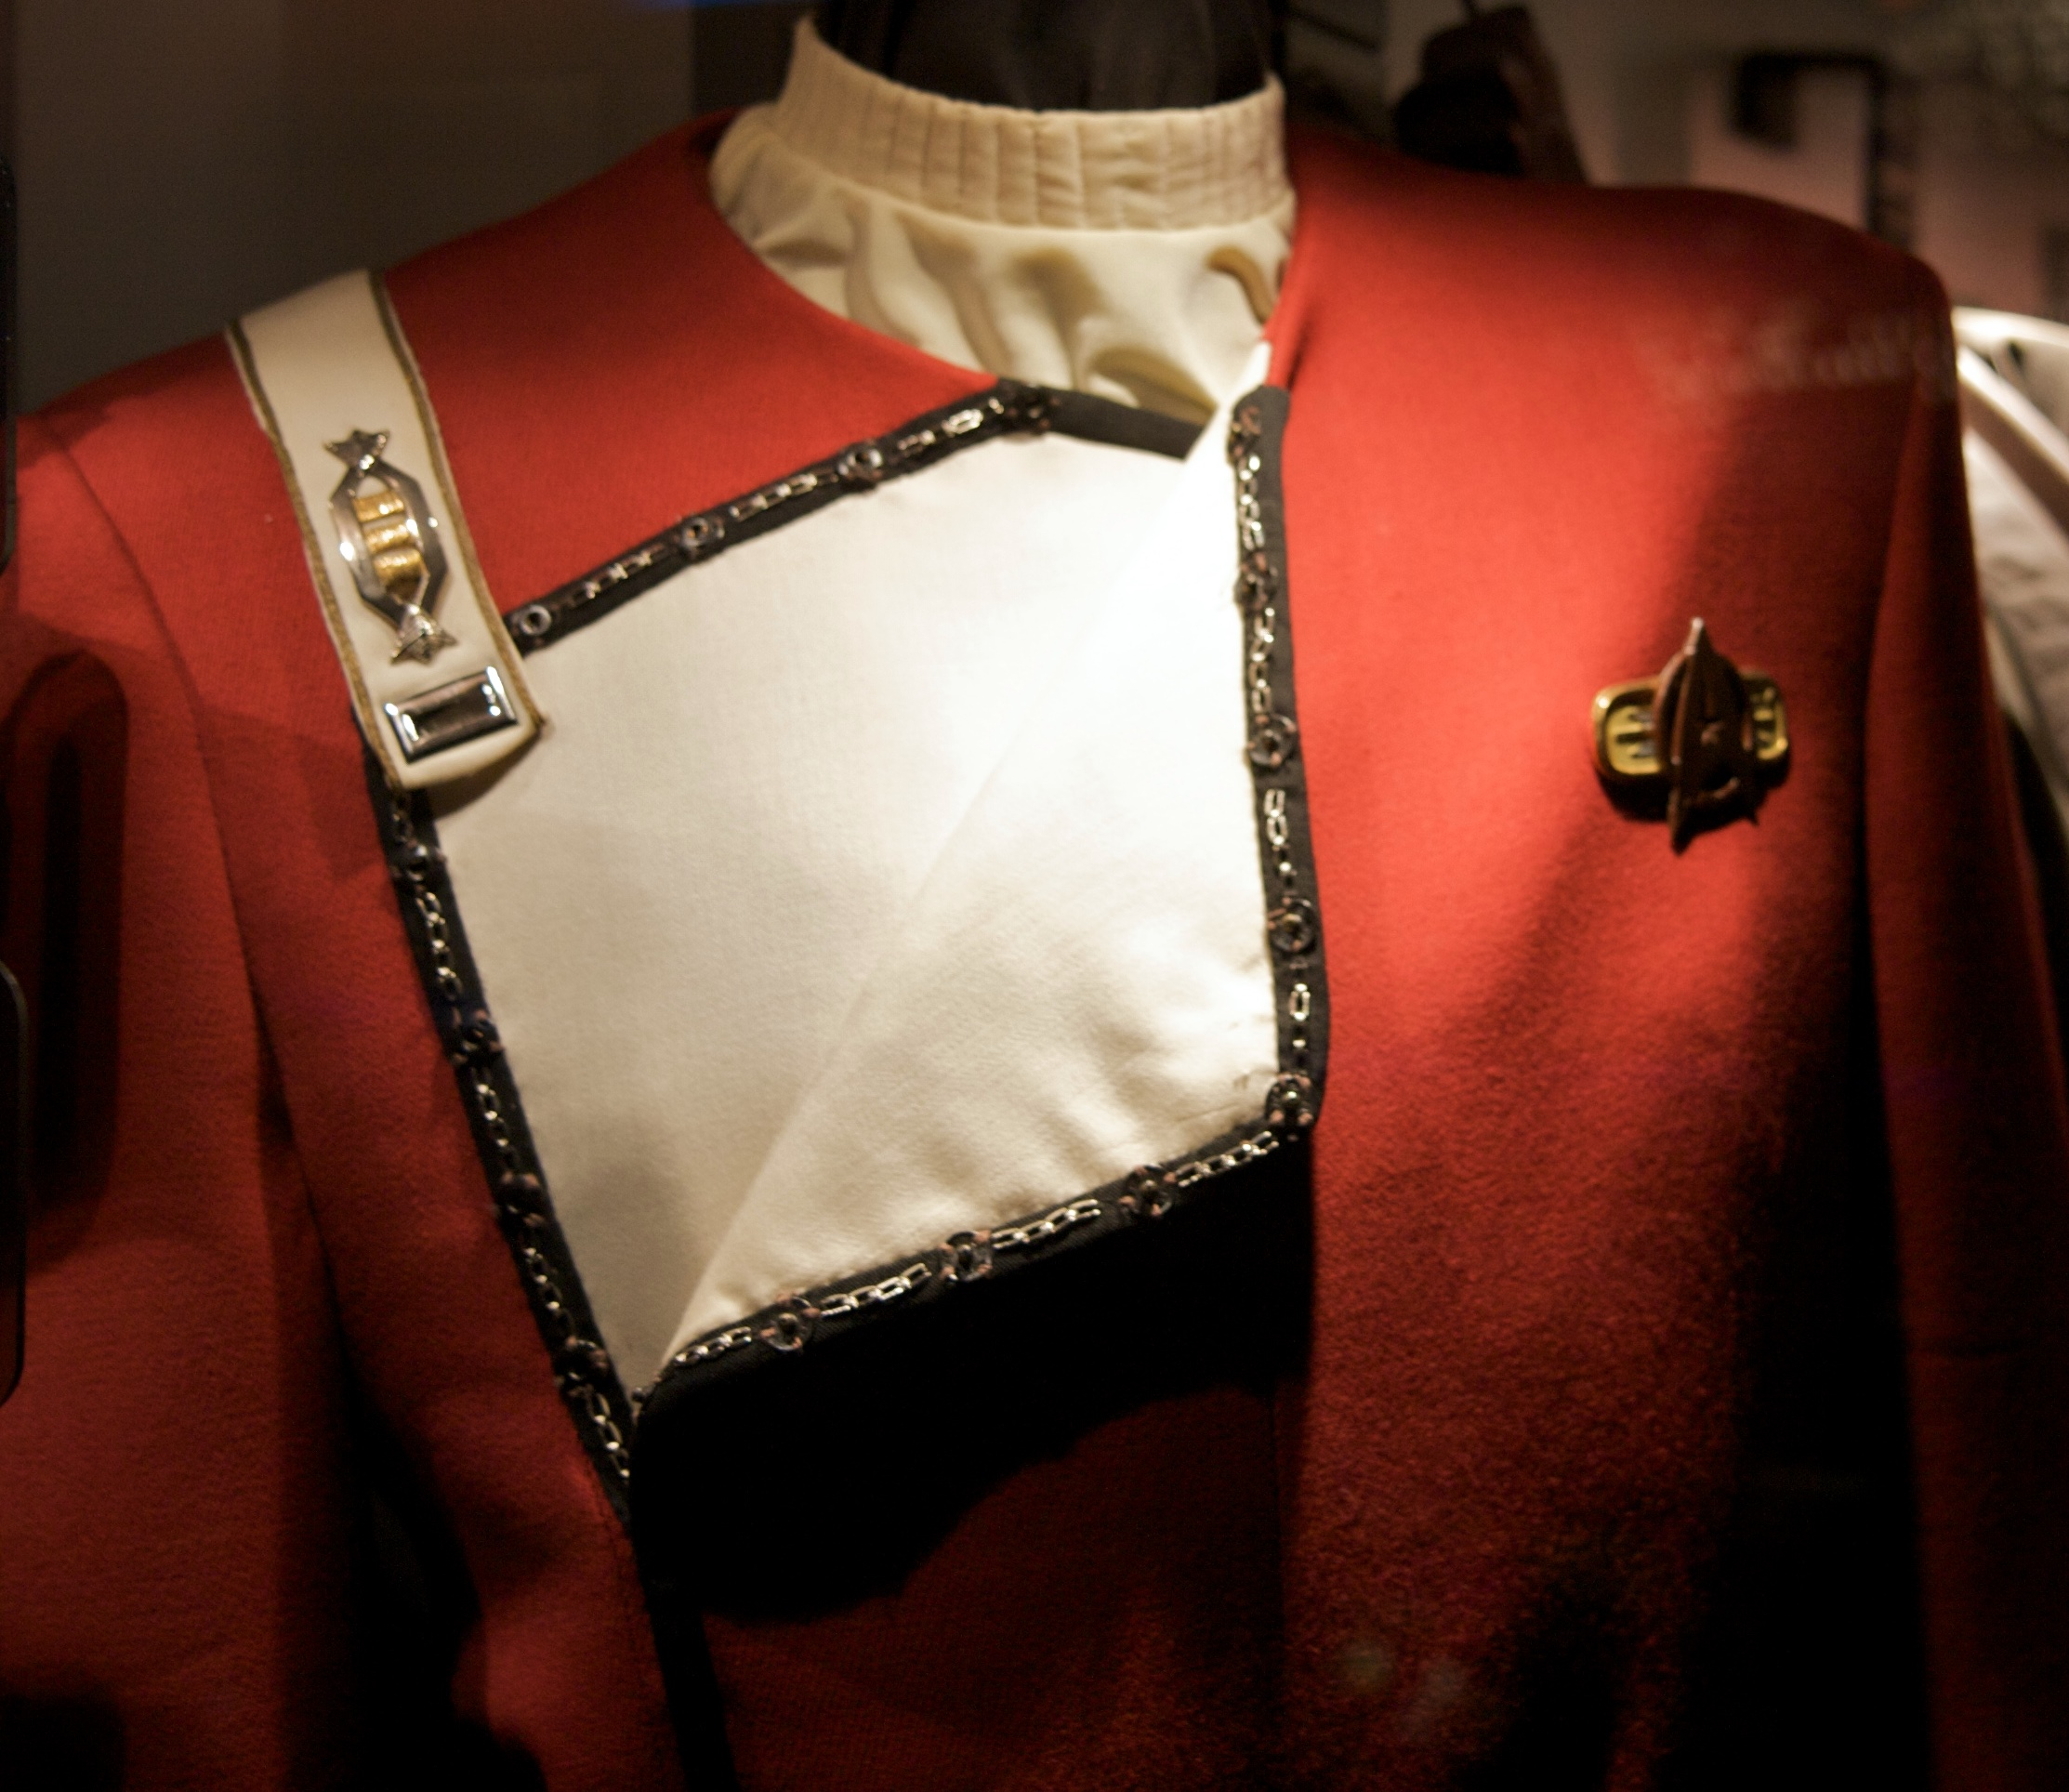 http://upload.wikimedia.org/wikipedia/commons/c/ce/Star_Trek_Wrath_of_Khan_uniforms.jpg